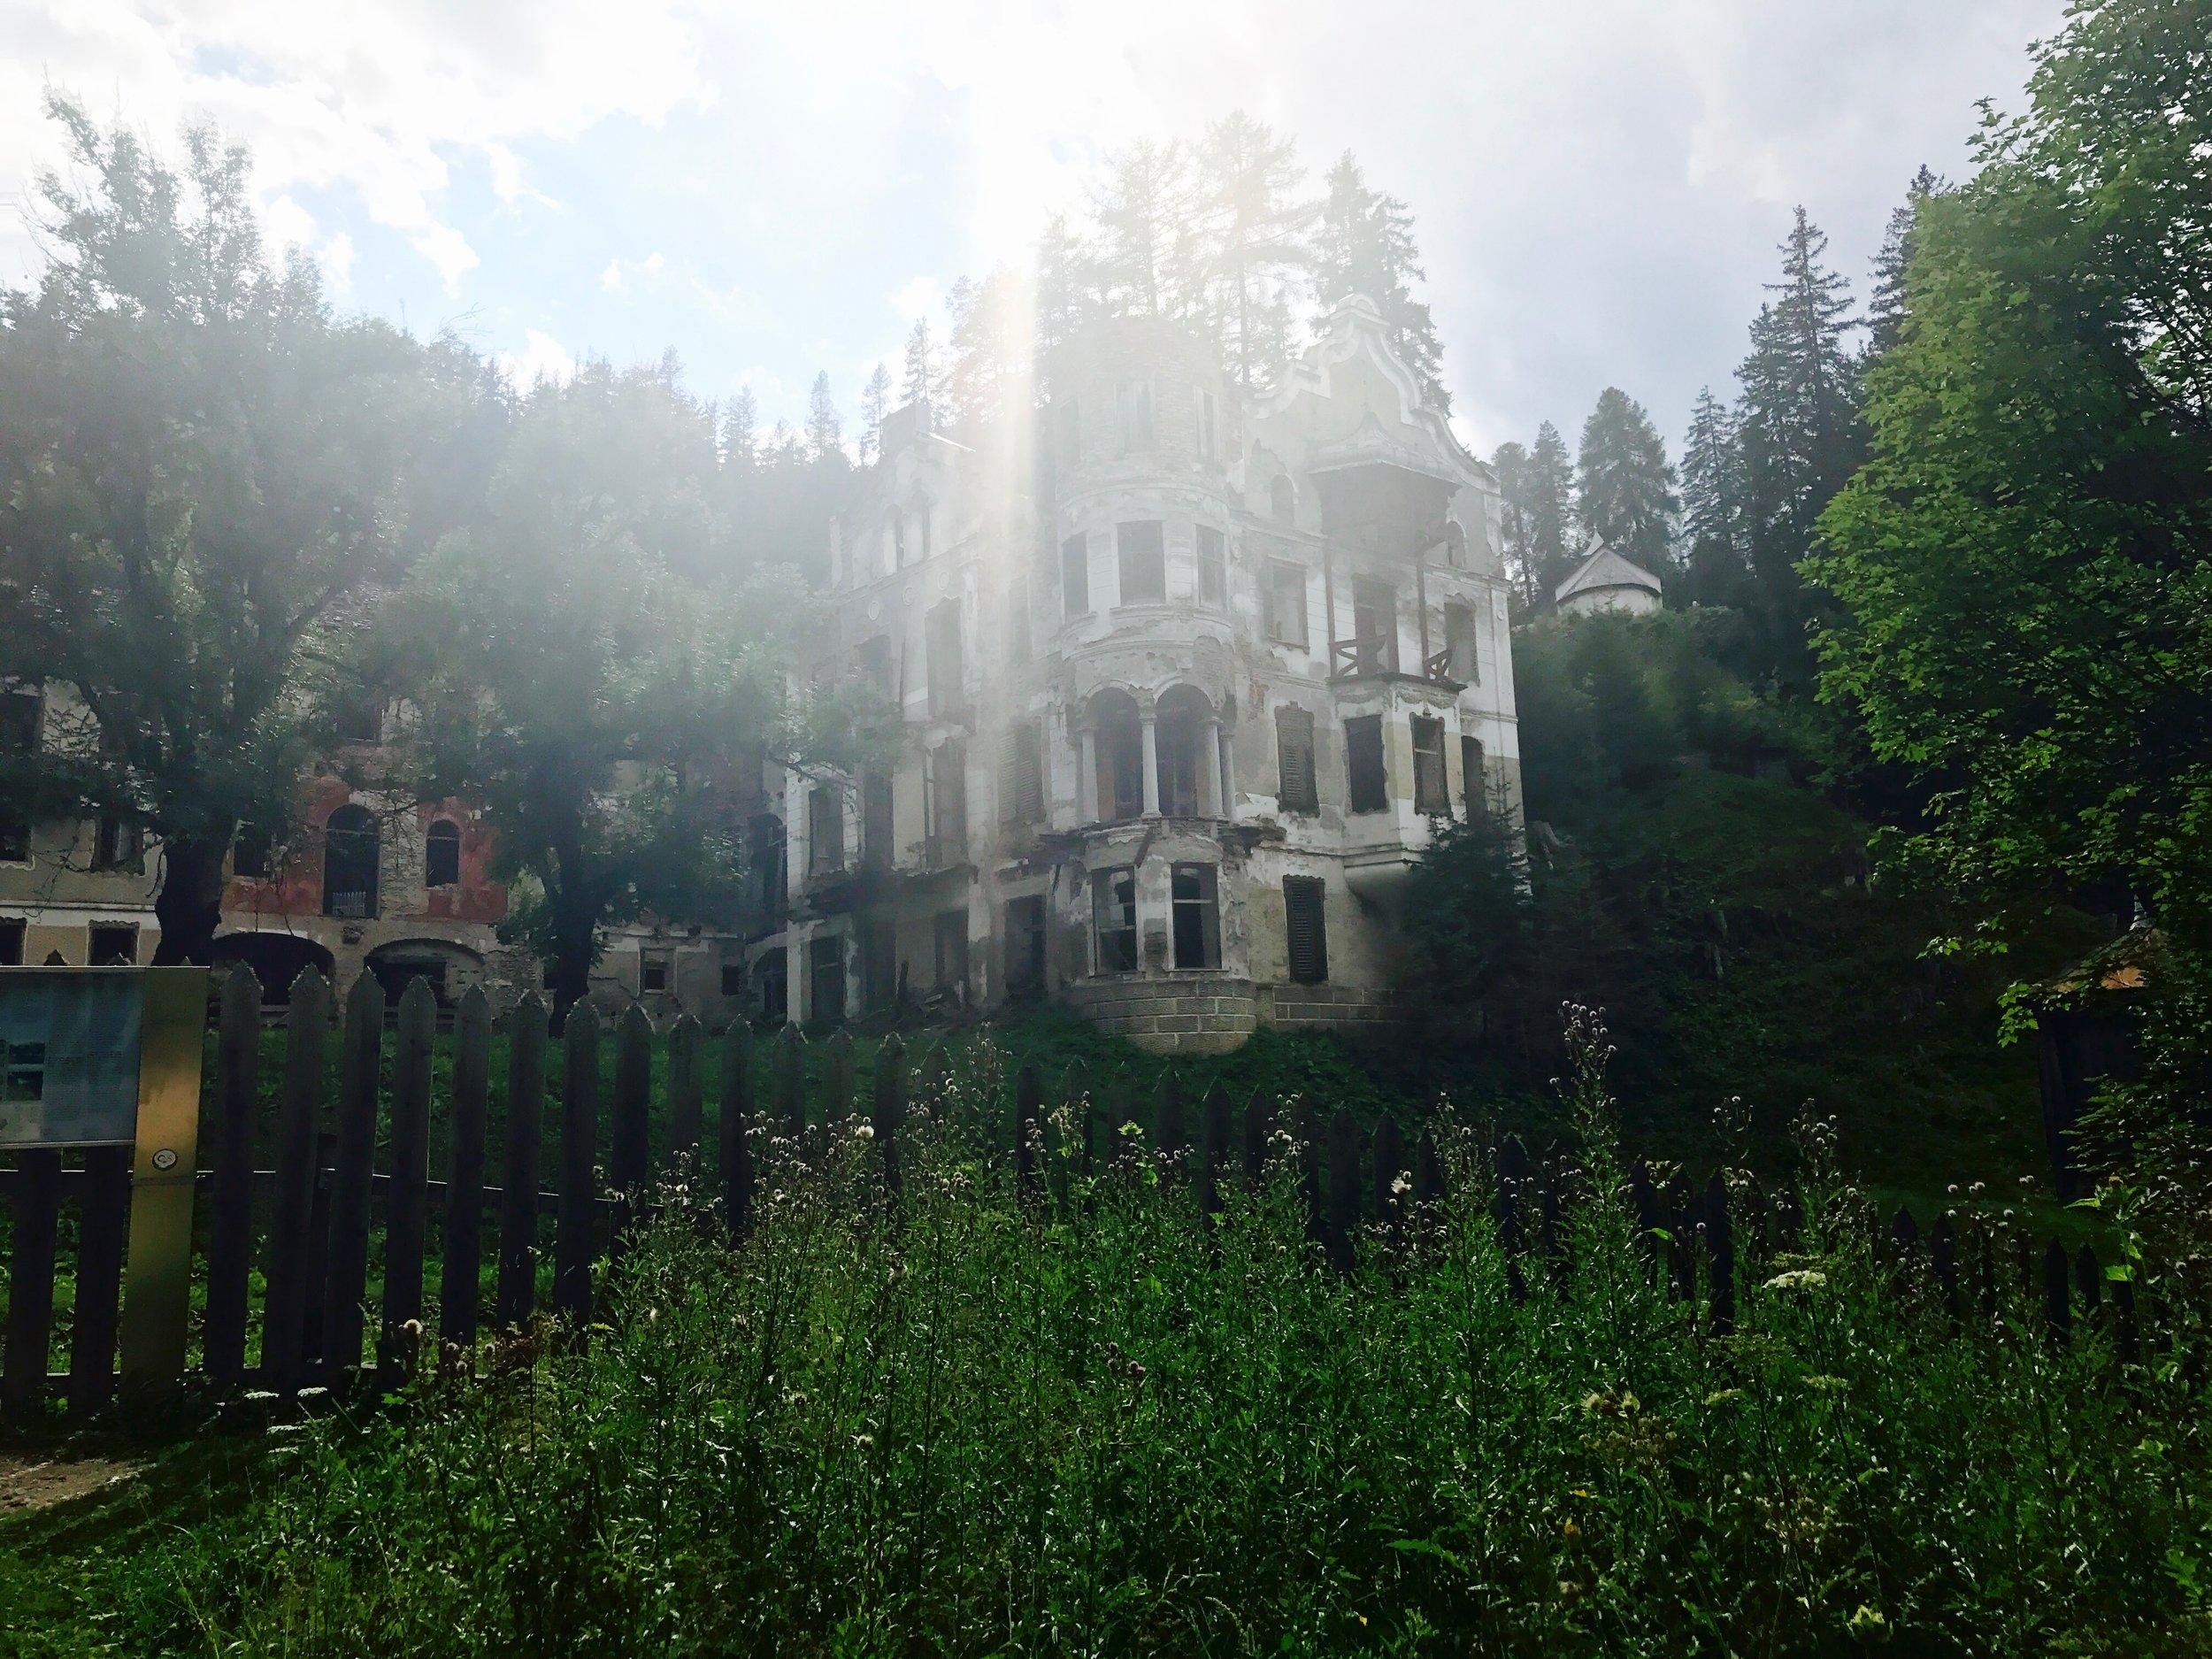 abandoned sanatorium, South Tyrol, Italy - 3 Days*